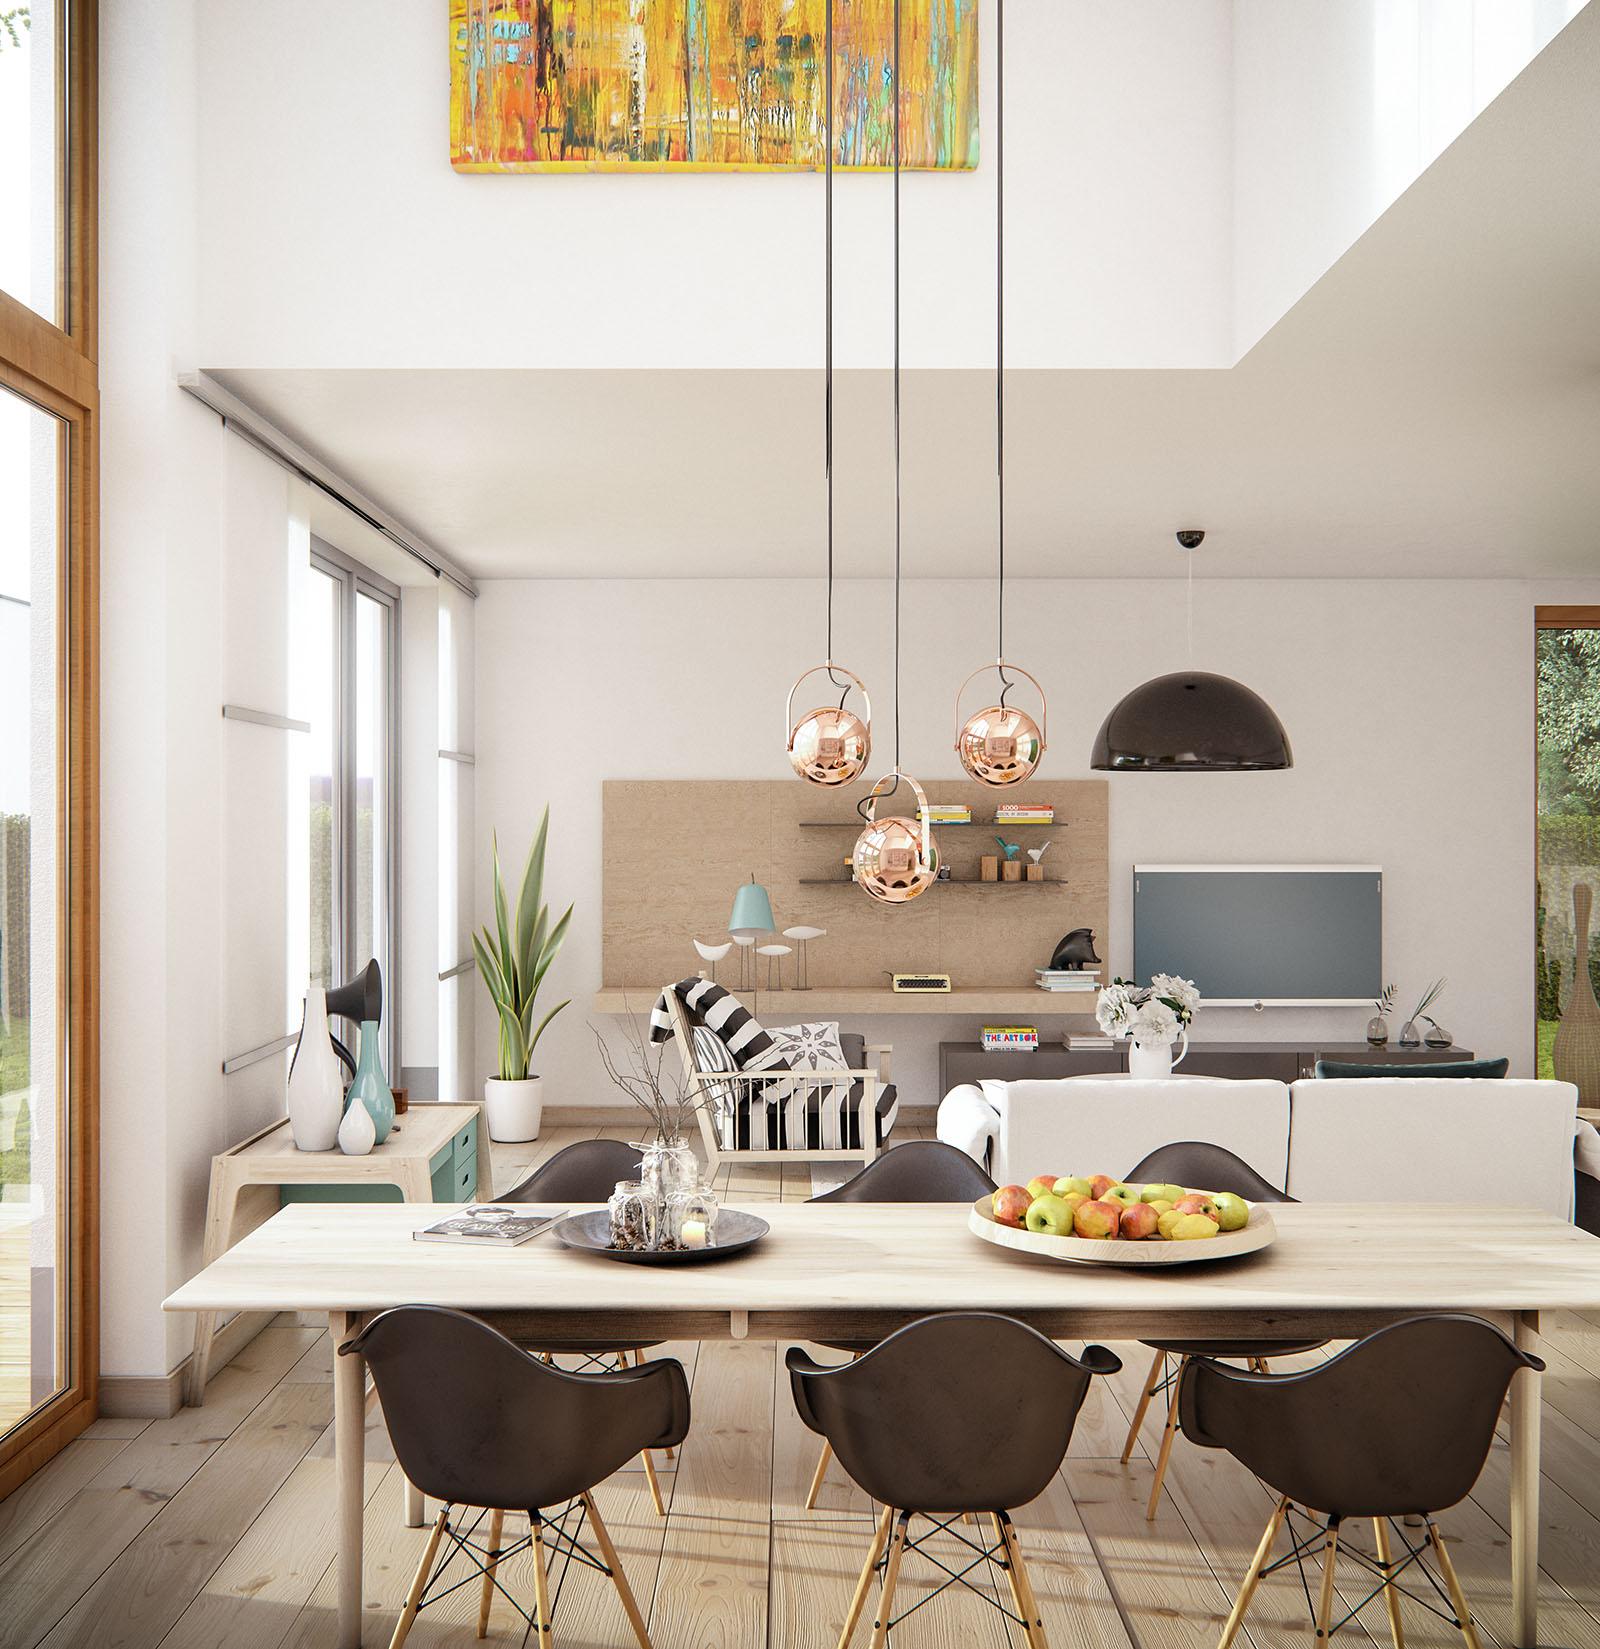 VWArtclub - Tips & Tricks For Scandinavian Interiors